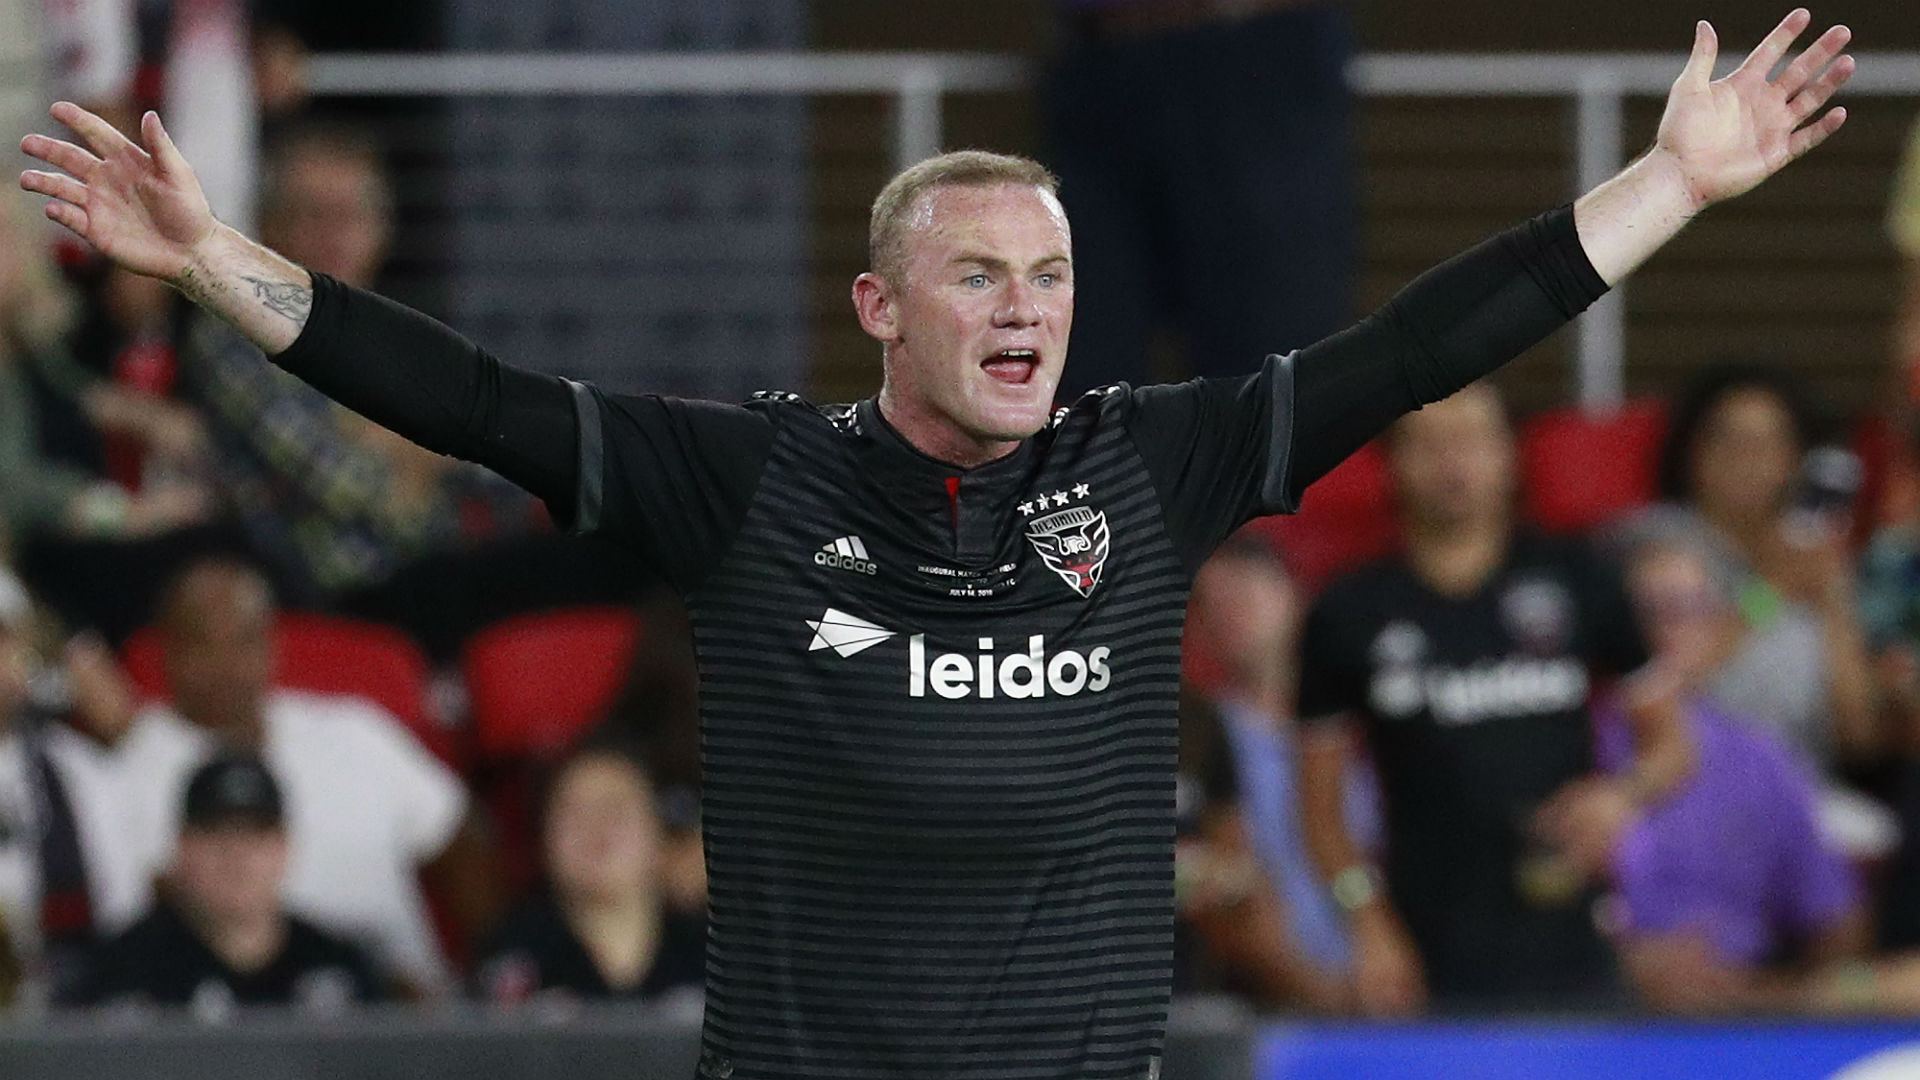 Rooney-Wayne-USNews-072818-ftr-getty